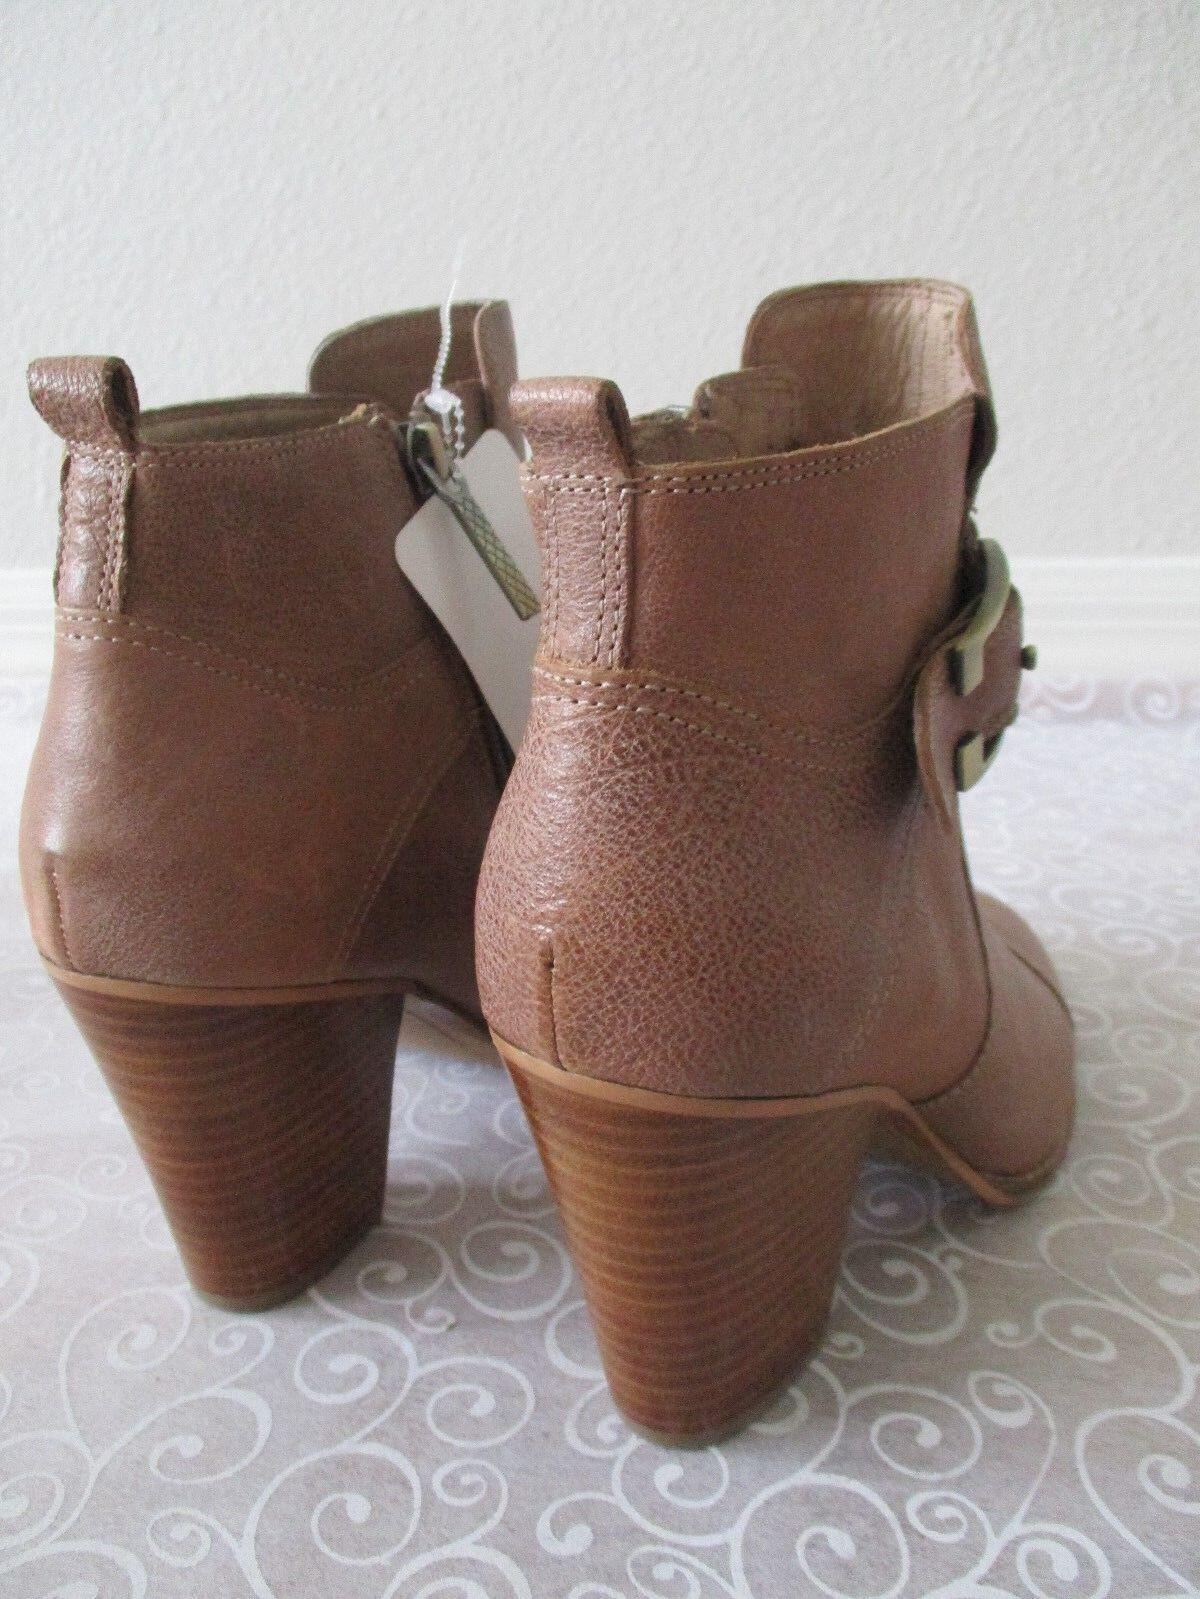 DONALD J PLINER braun BEIGE LEATHER ANKLE Stiefel Stiefel Stiefel Größe 8 1 2 M - NEW e01834